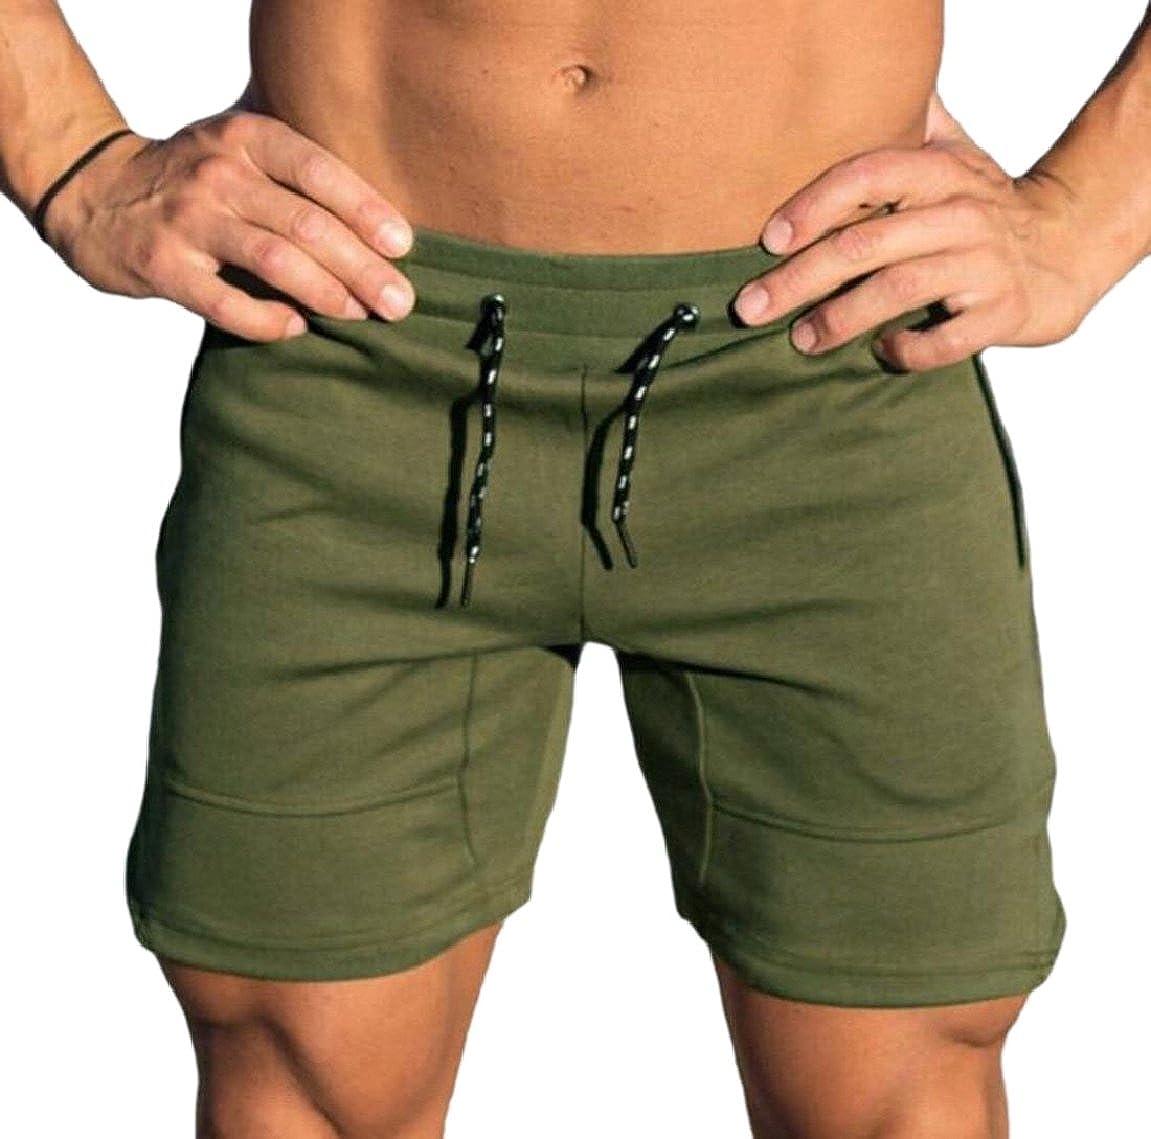 pujingge-CA Men Gym Workout Shorts Weightlifting Squatting Shorts